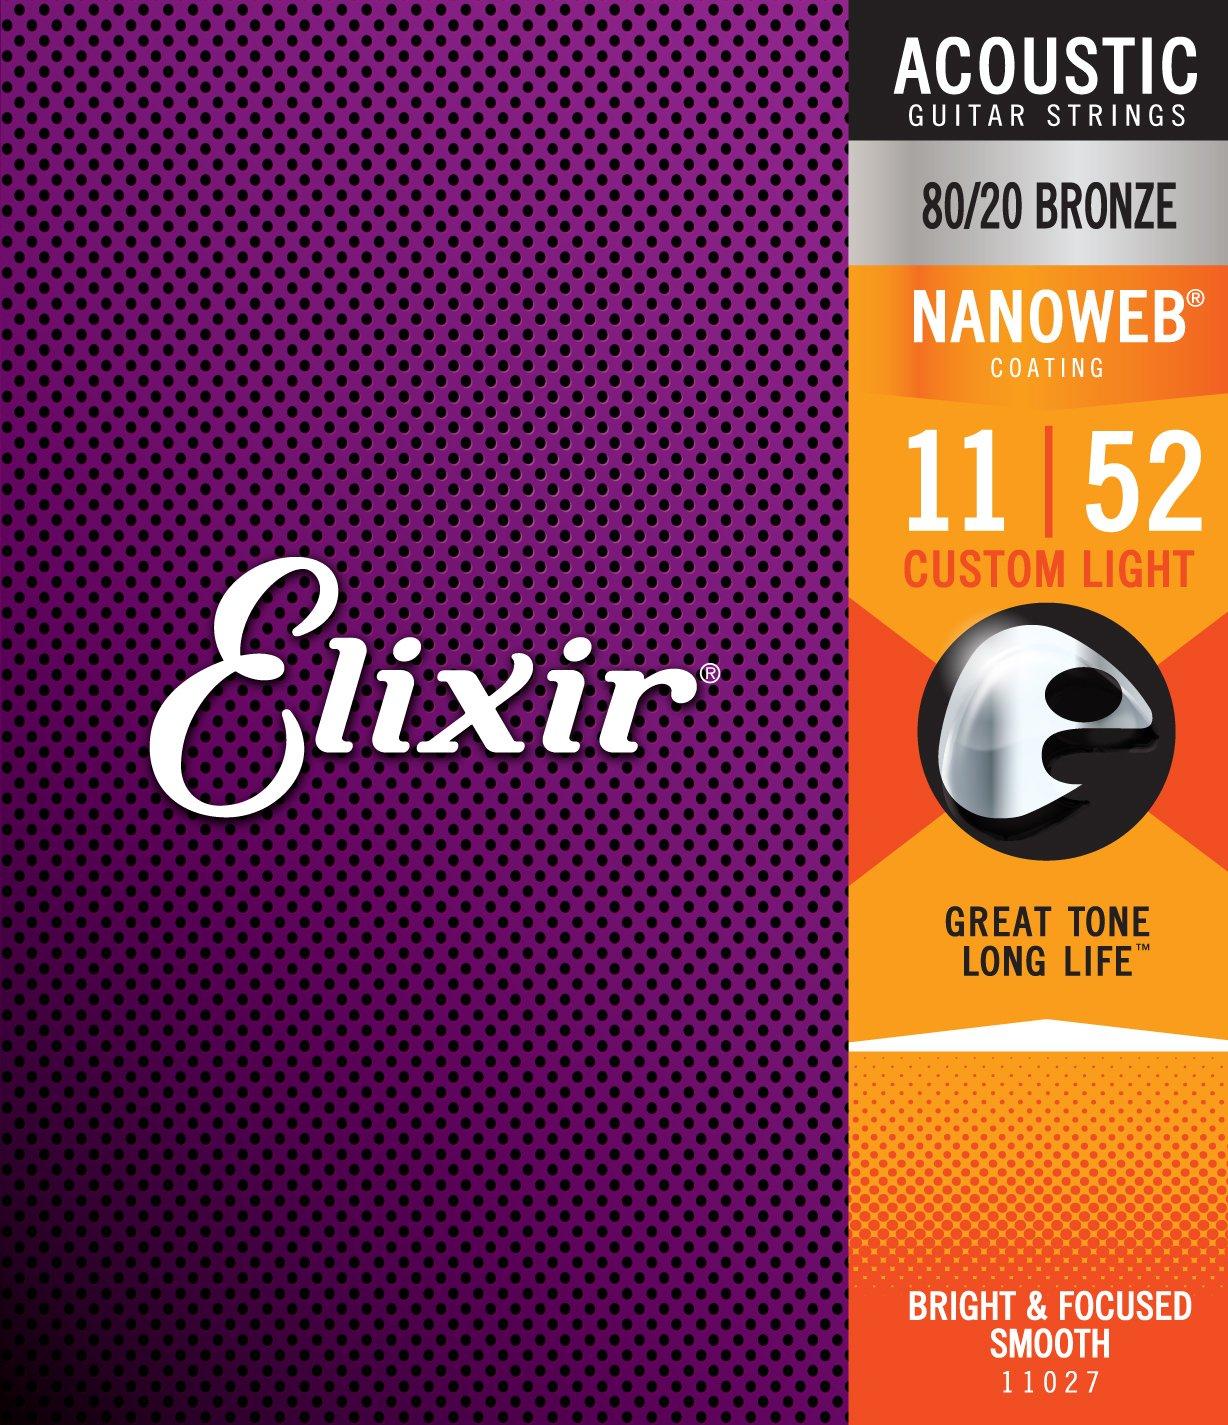 Elixir 80/20 Bronze 11027 Acoustic Guitar Strings, NANOWEB, Custom Light, 11-52